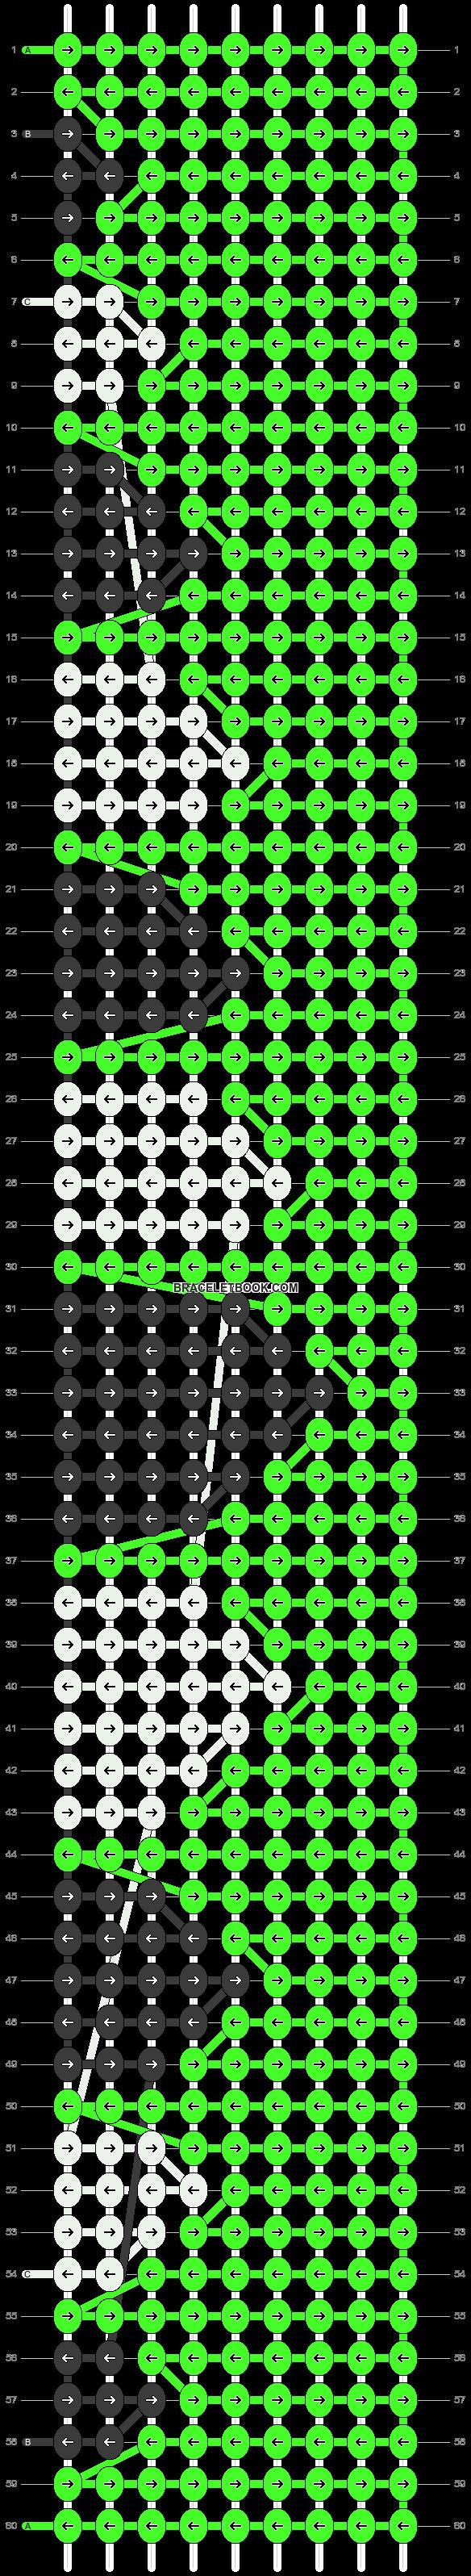 Alpha pattern #21061 pattern